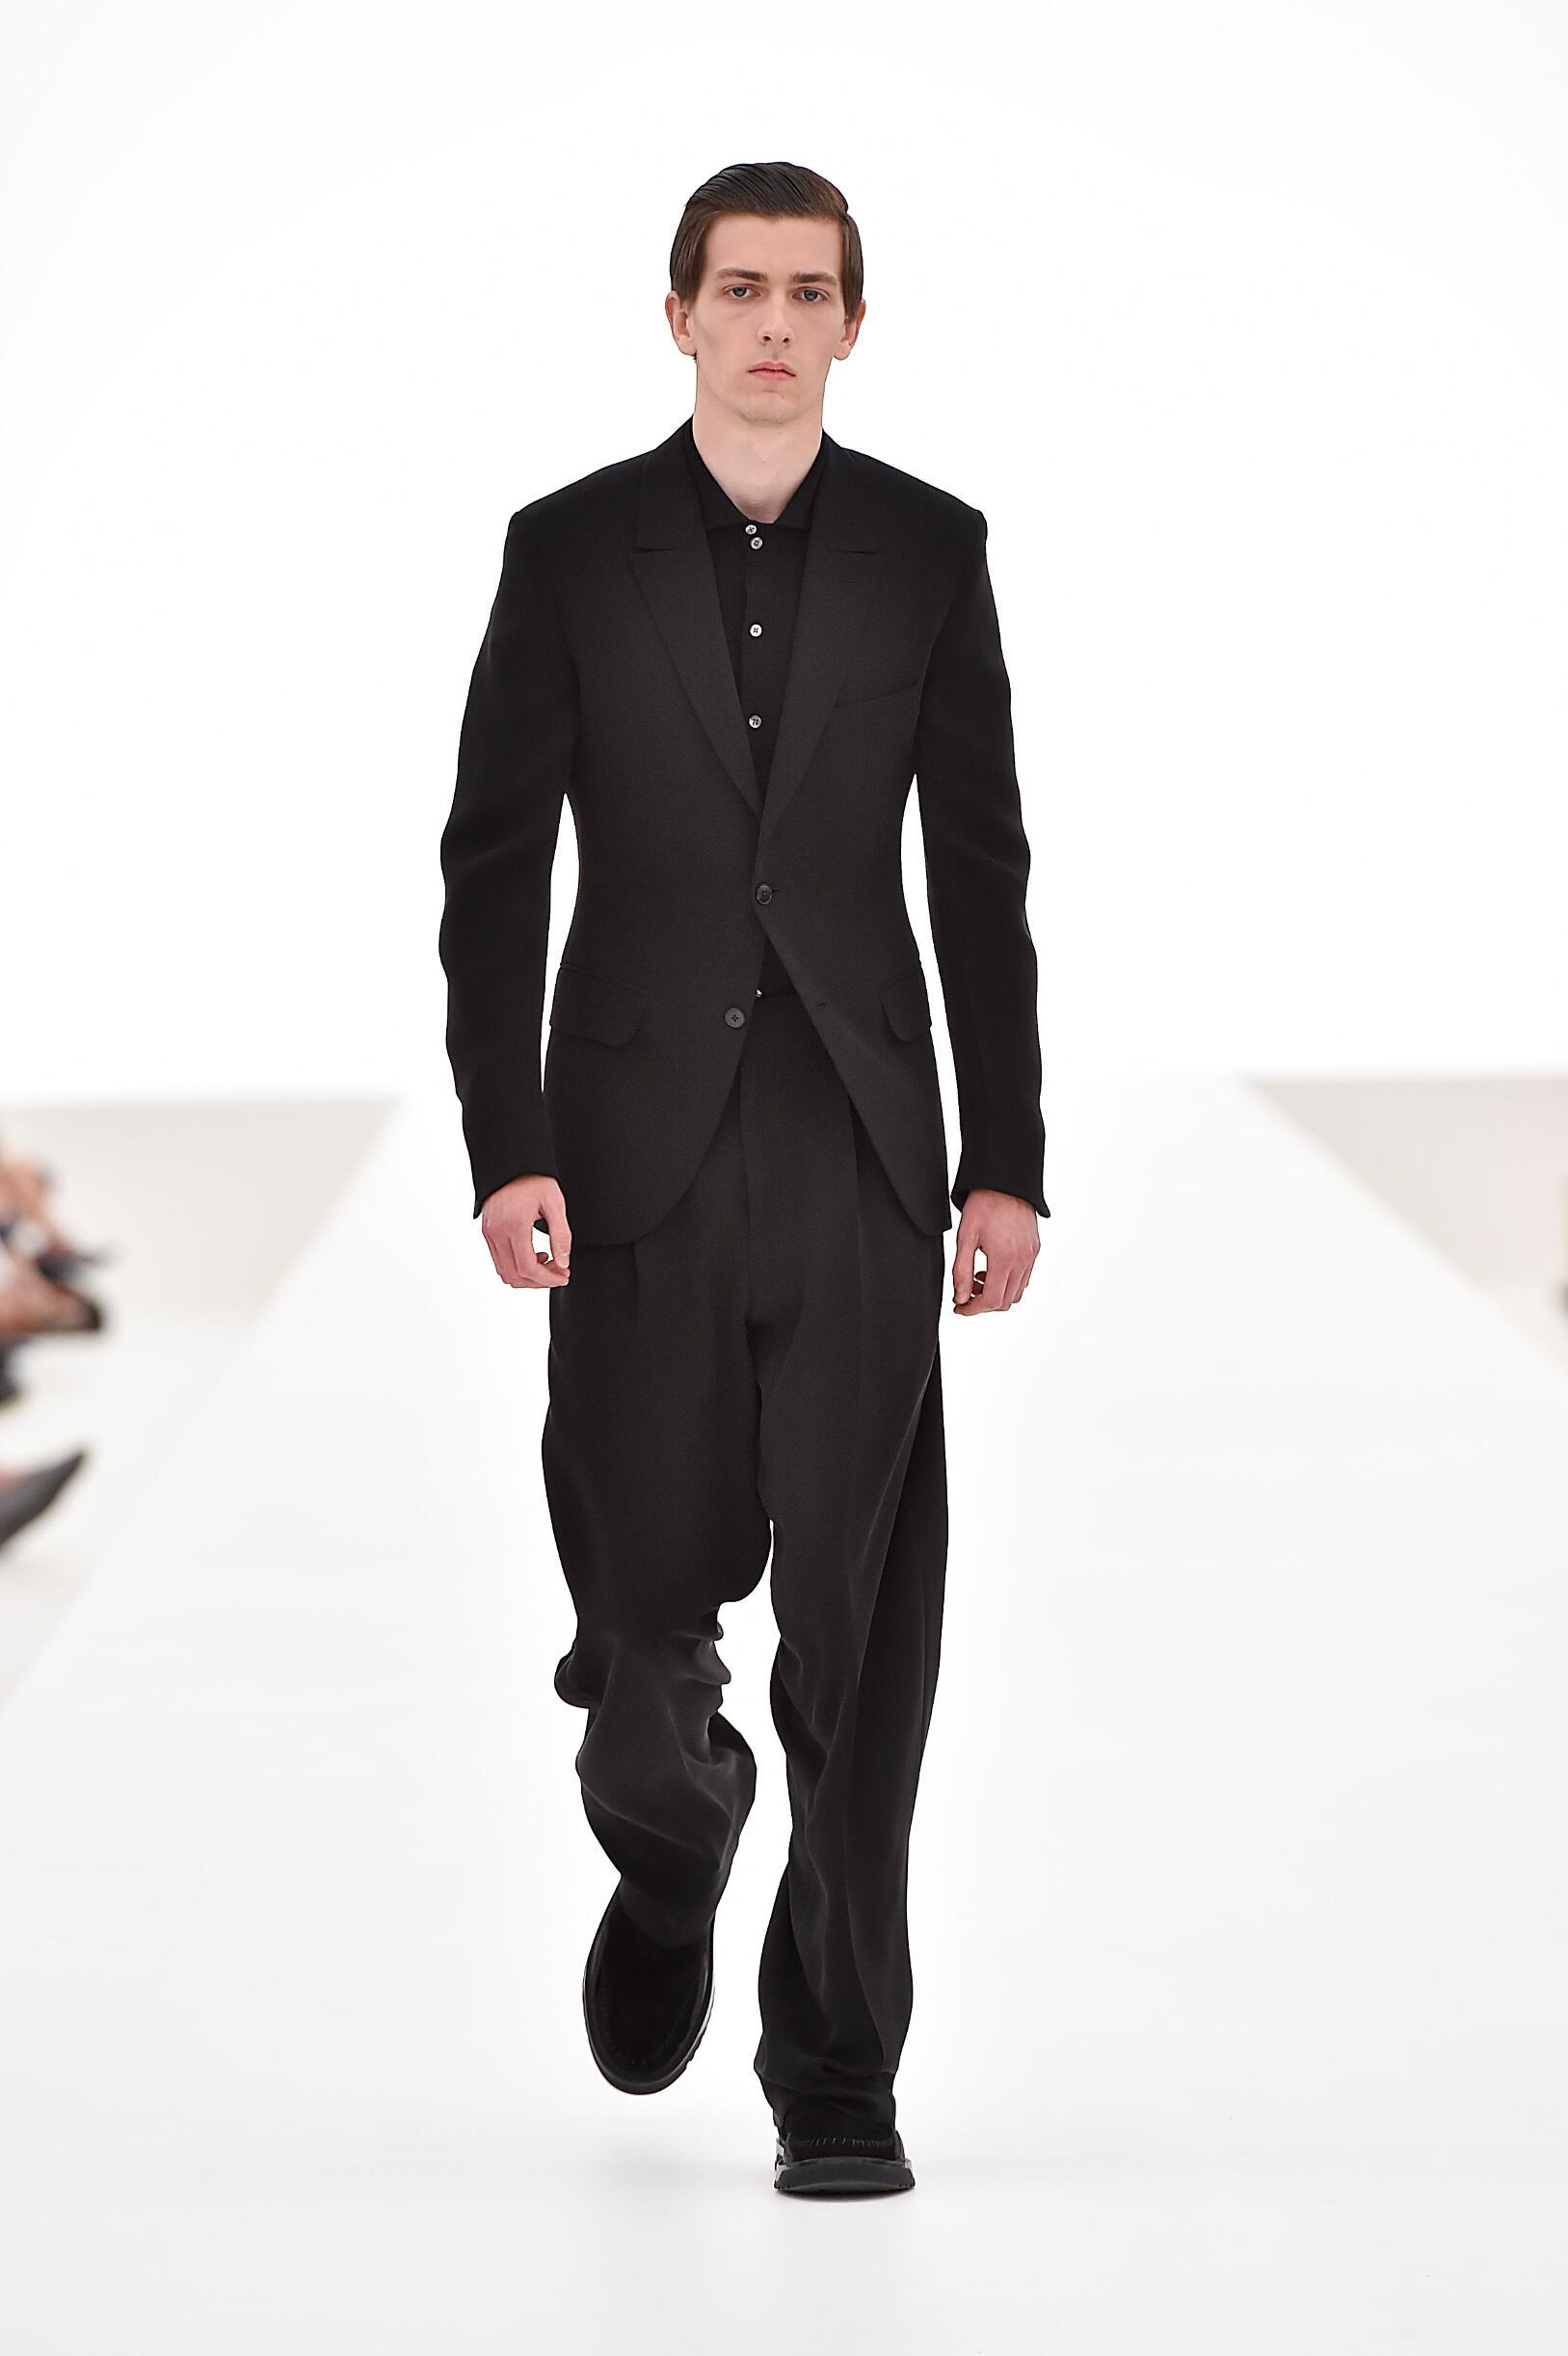 Spring Fashion Man Ermenegildo Zegna Couture Collection